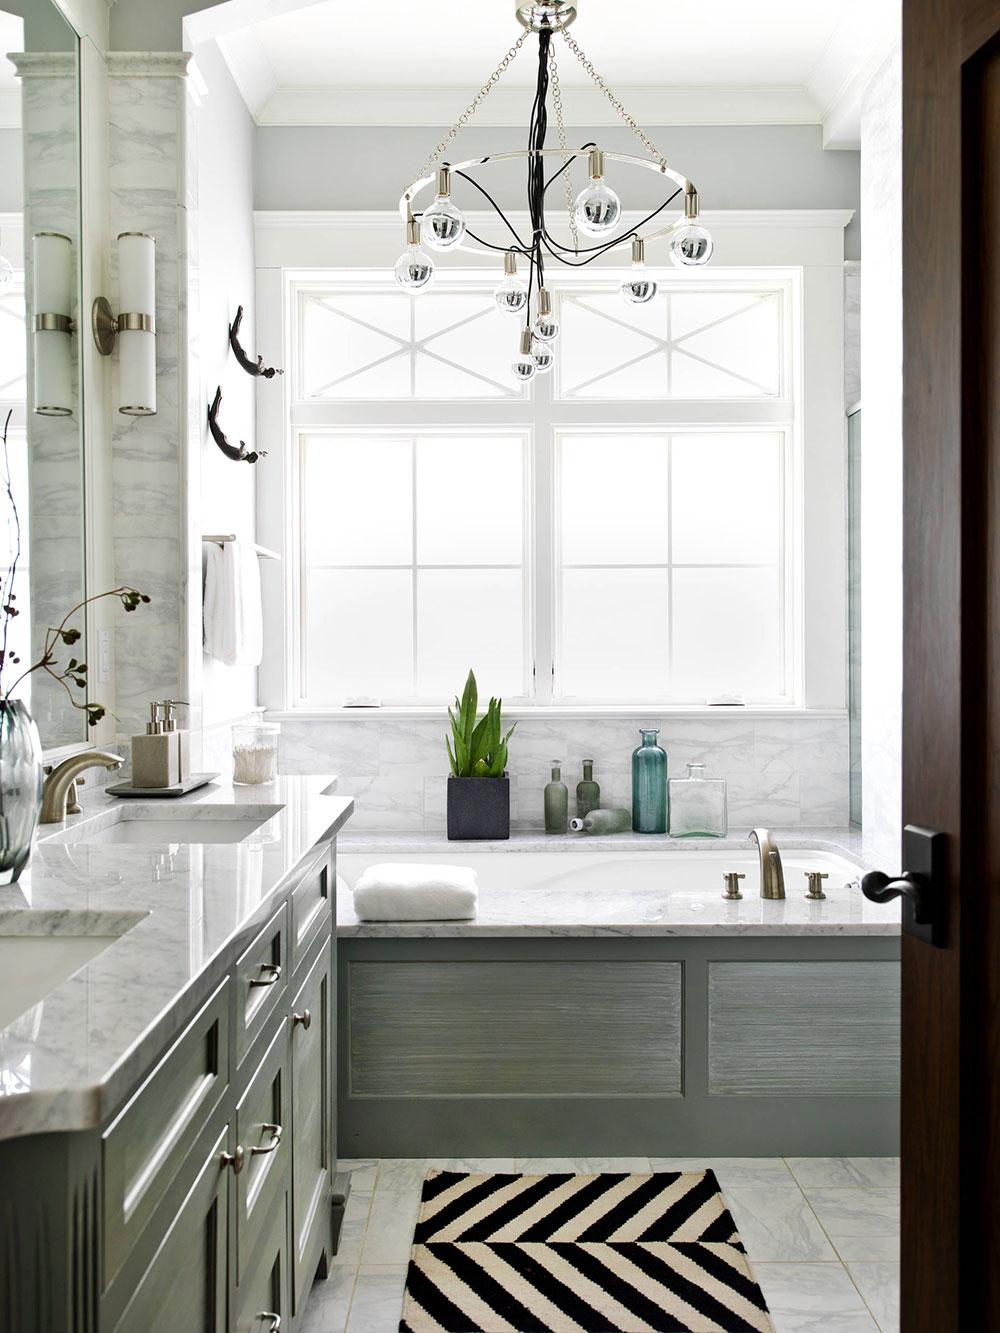 Tips-for-spa-bathroom-design-ideas11 tips for a spa bathroom makeover